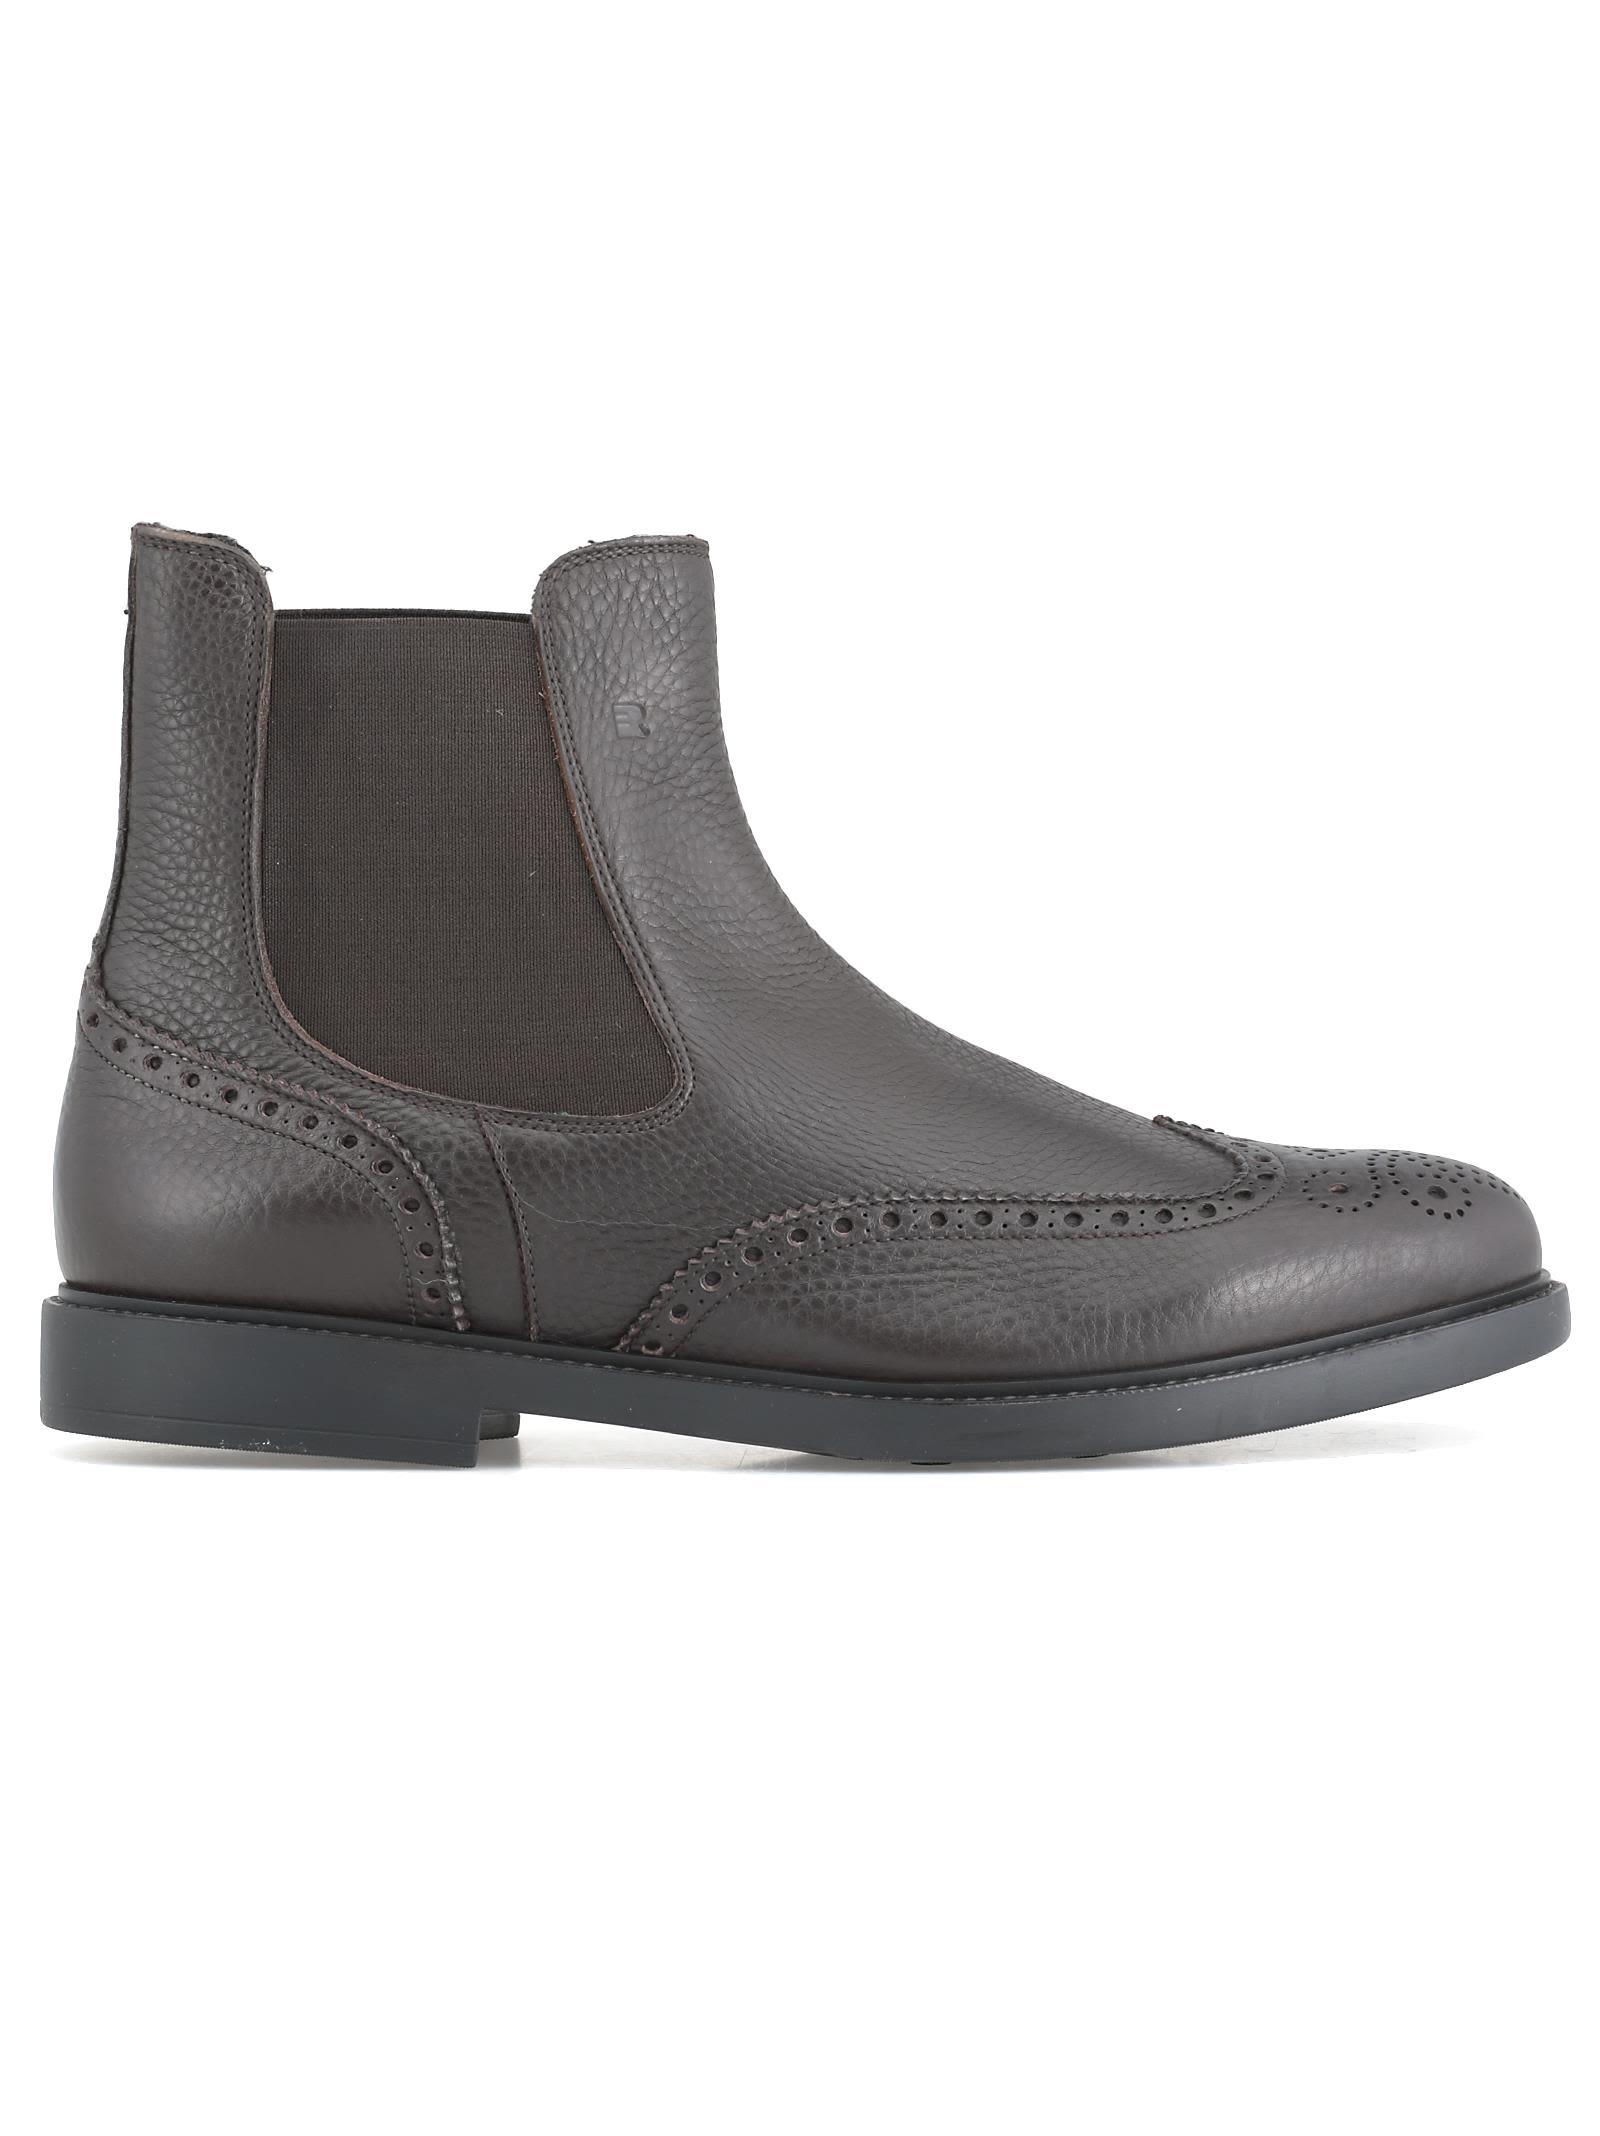 FRATELLI ROSSETTI Leather Chelsea Boot in Ebano